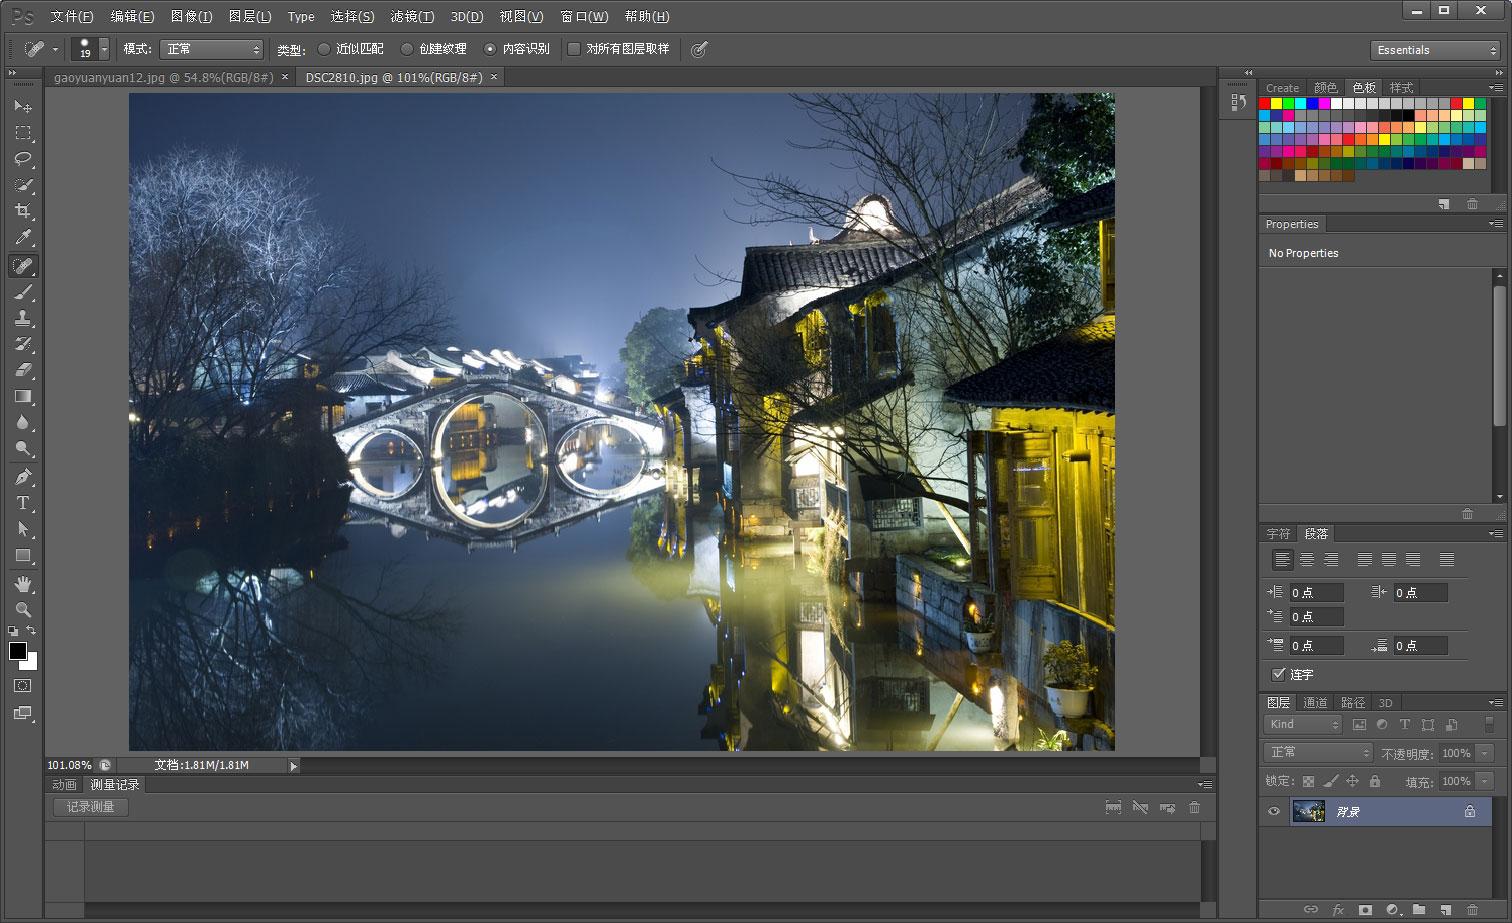 Adobe Photoshop CS6(图片处理软件)V13.1.3 Extended 官方精简中文版